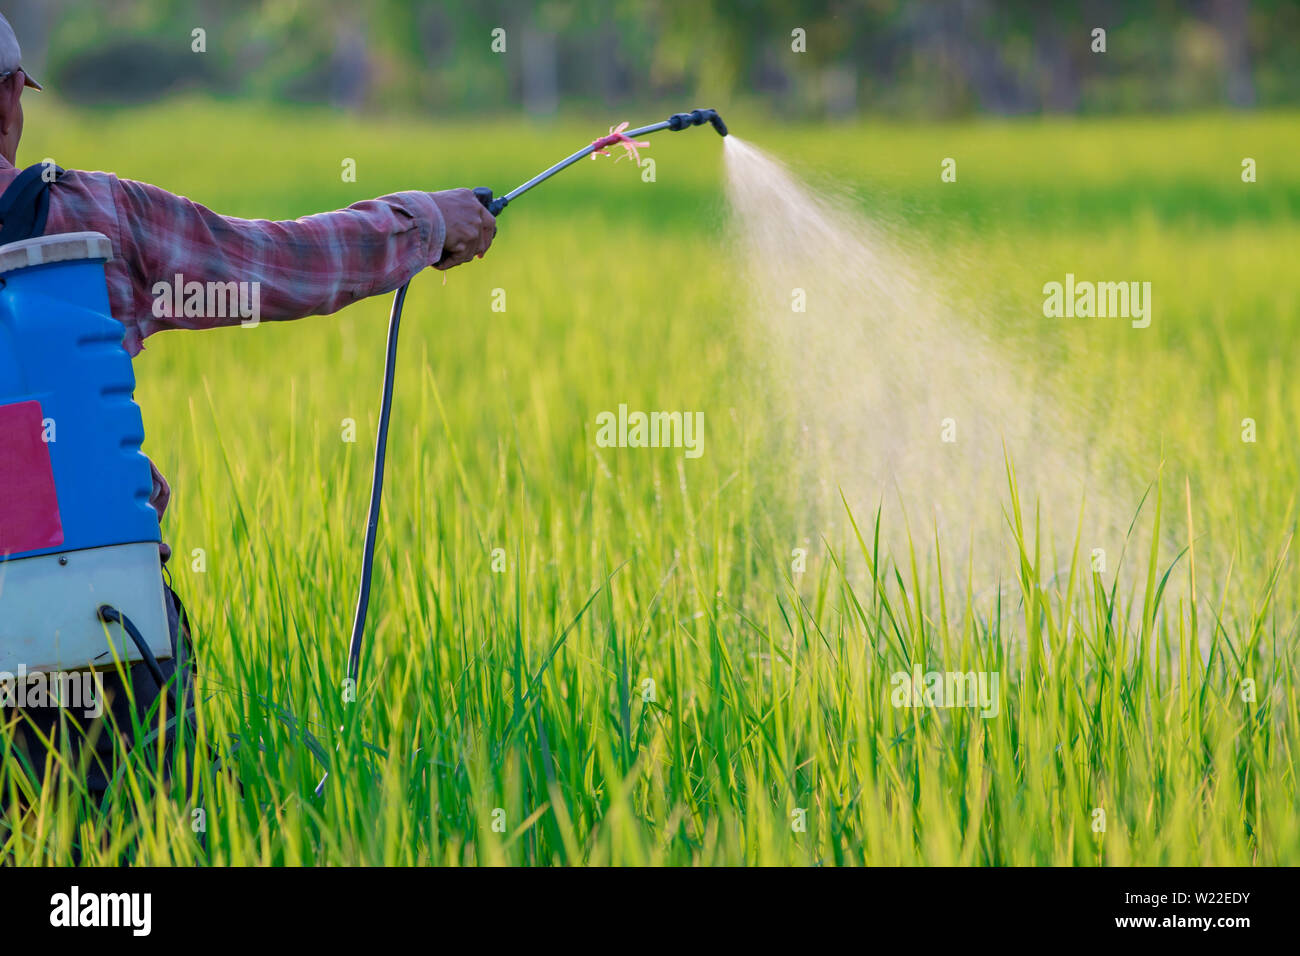 spraying pesticide - Stock Image